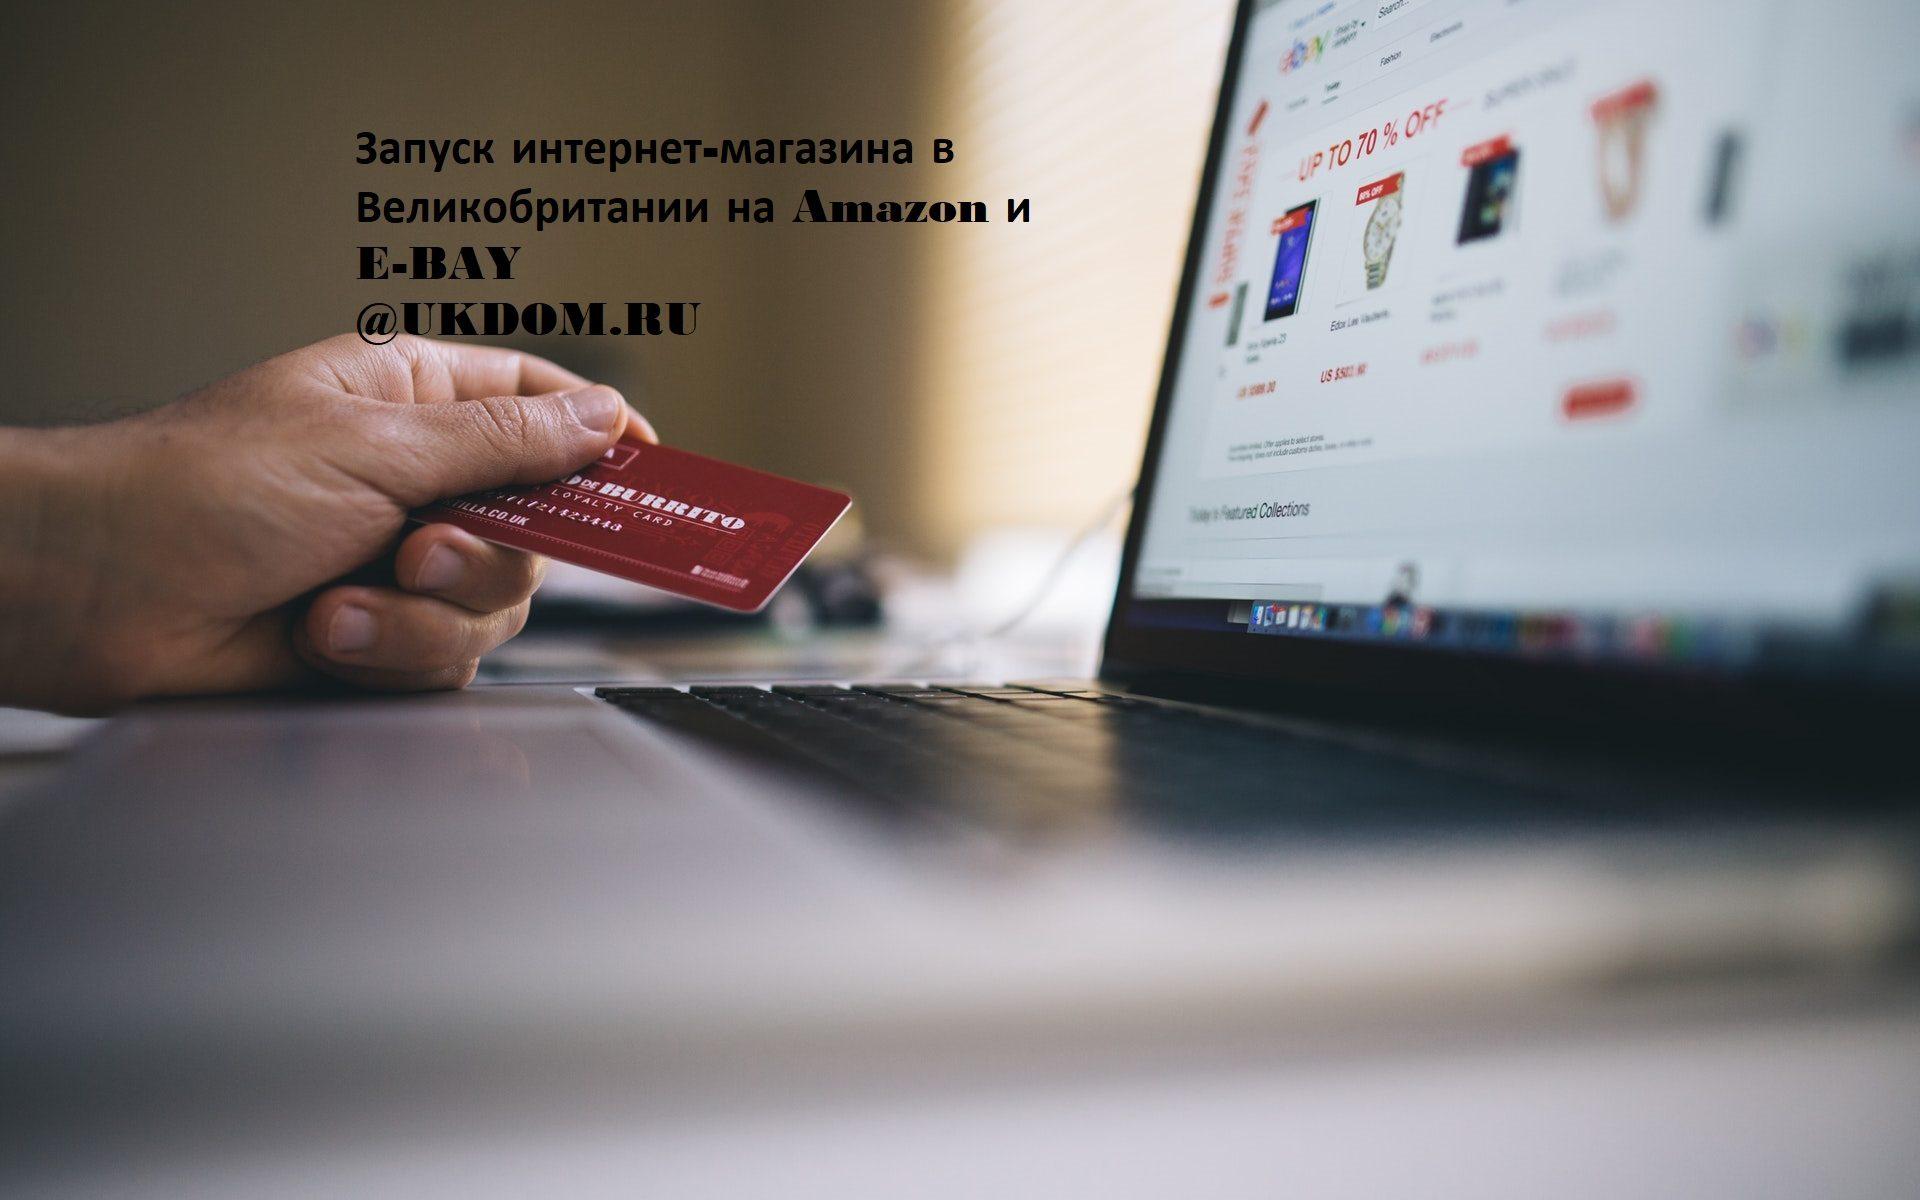 Запуск интернет-магазина в Великобритании на Amazon и E-BAY